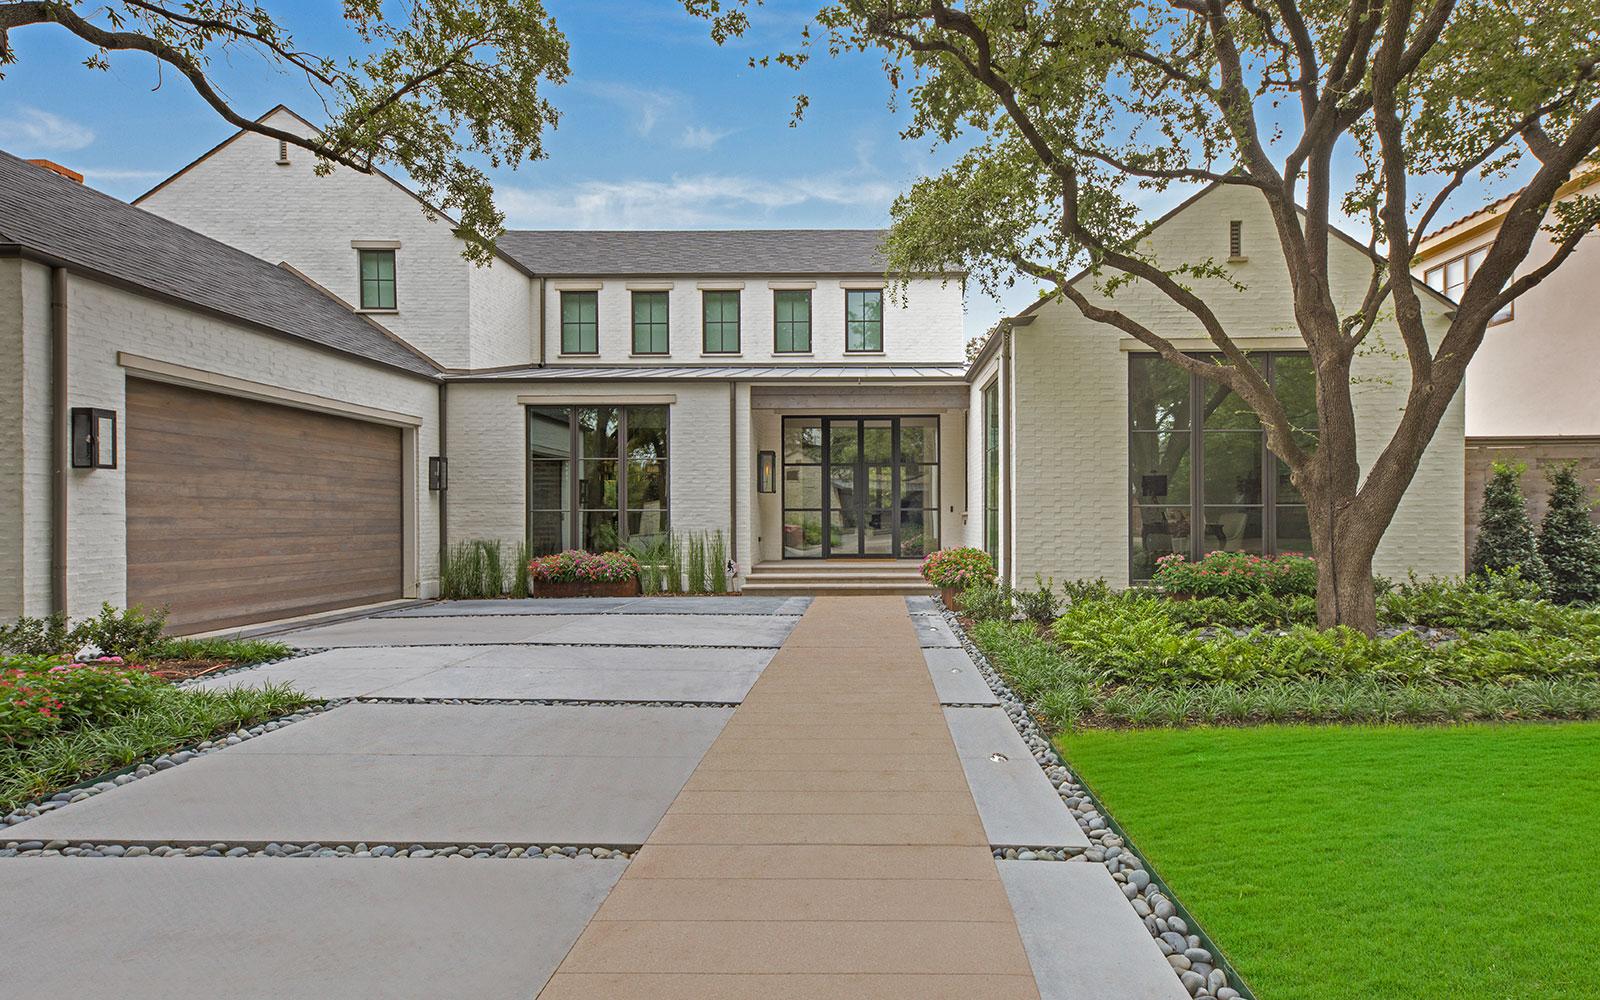 ddla-design-pemberton-modern-front-entry-driveway-day.jpg